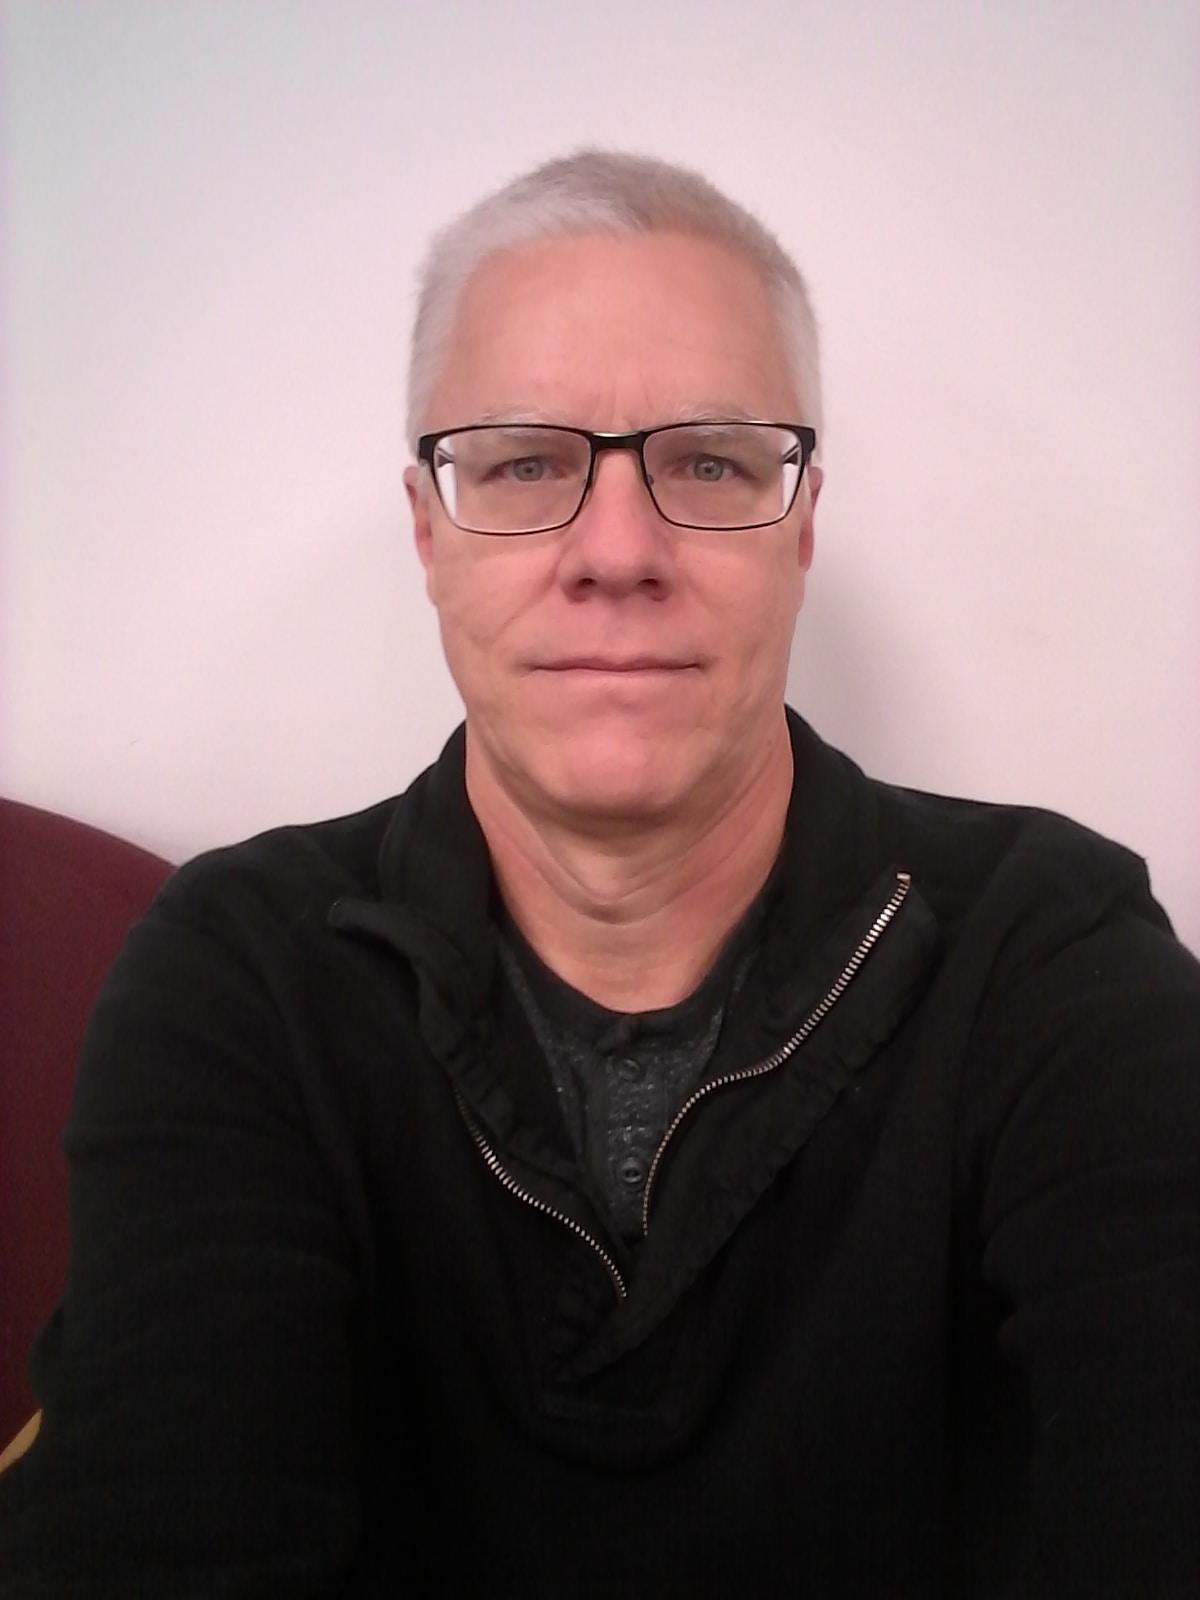 Go to Doug Duffee's profile